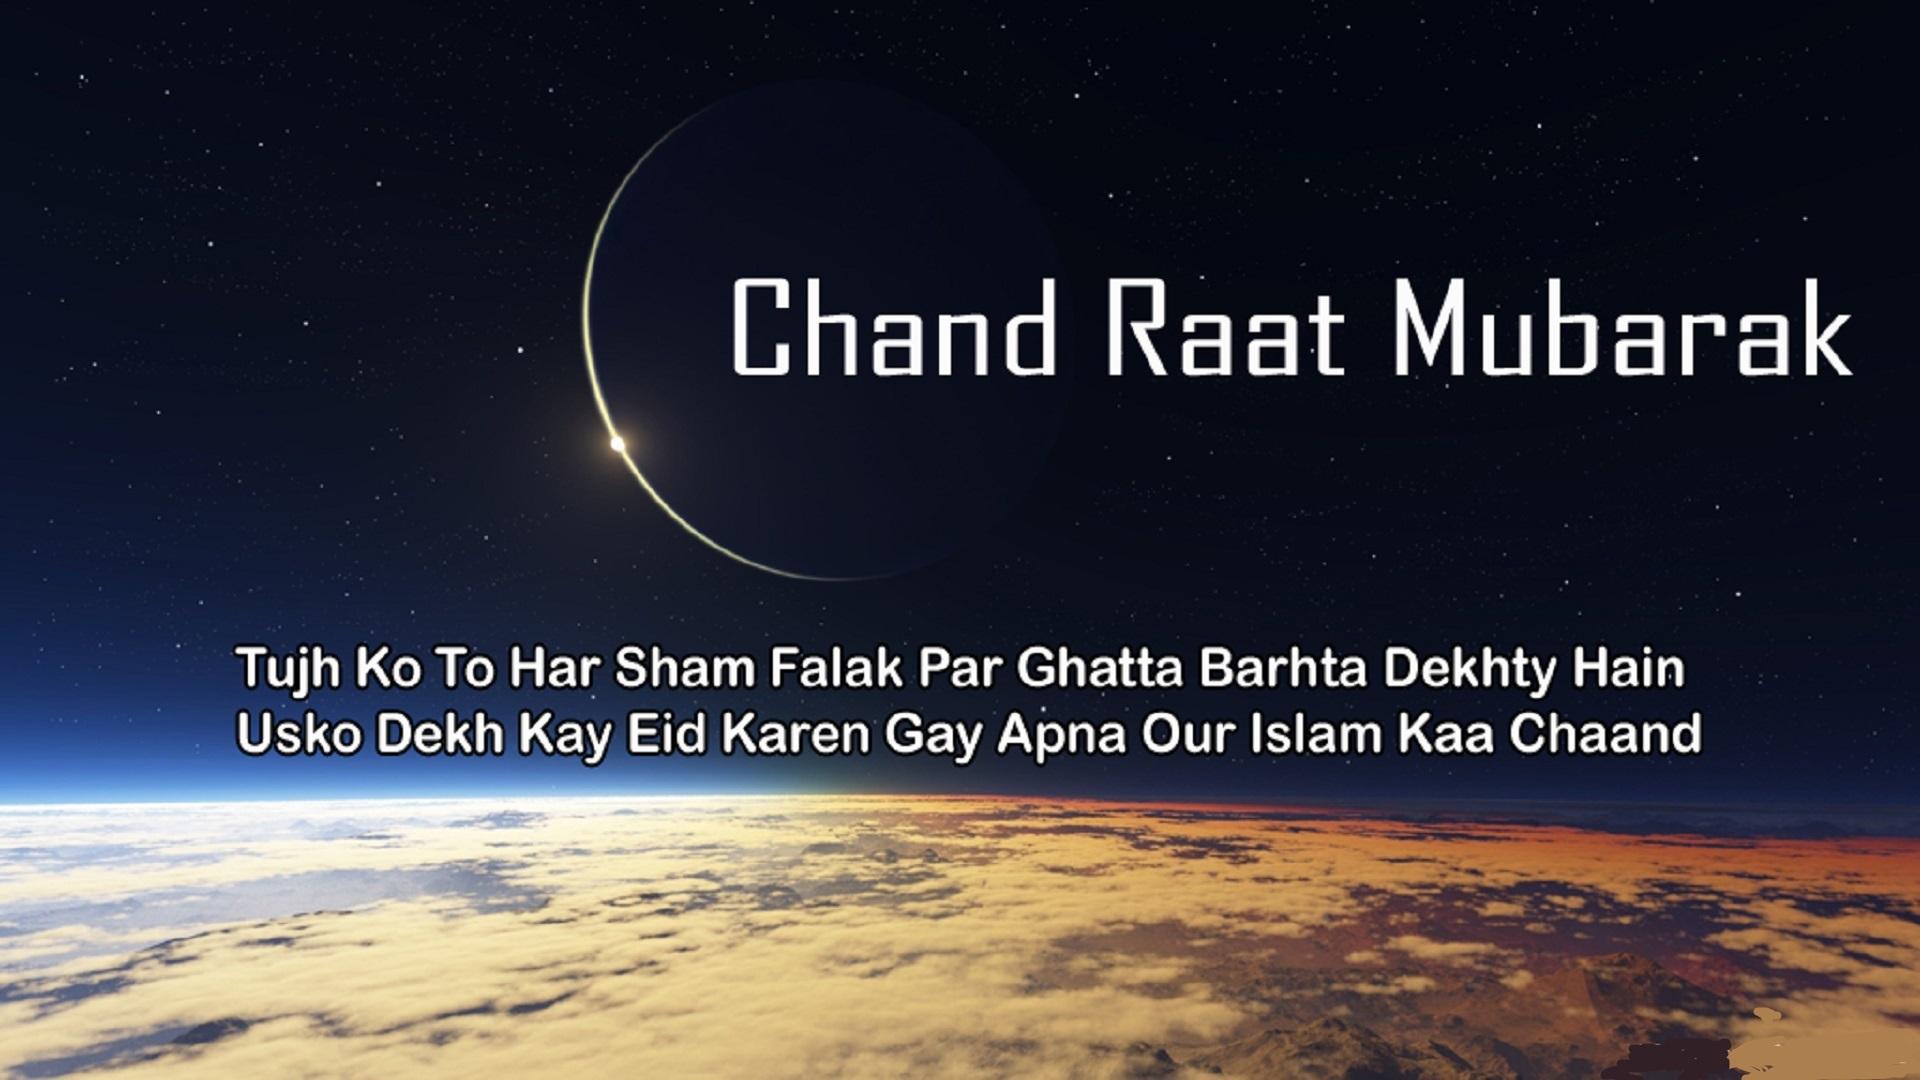 Chaand Raat Mubarak -free-hd-wallpapers